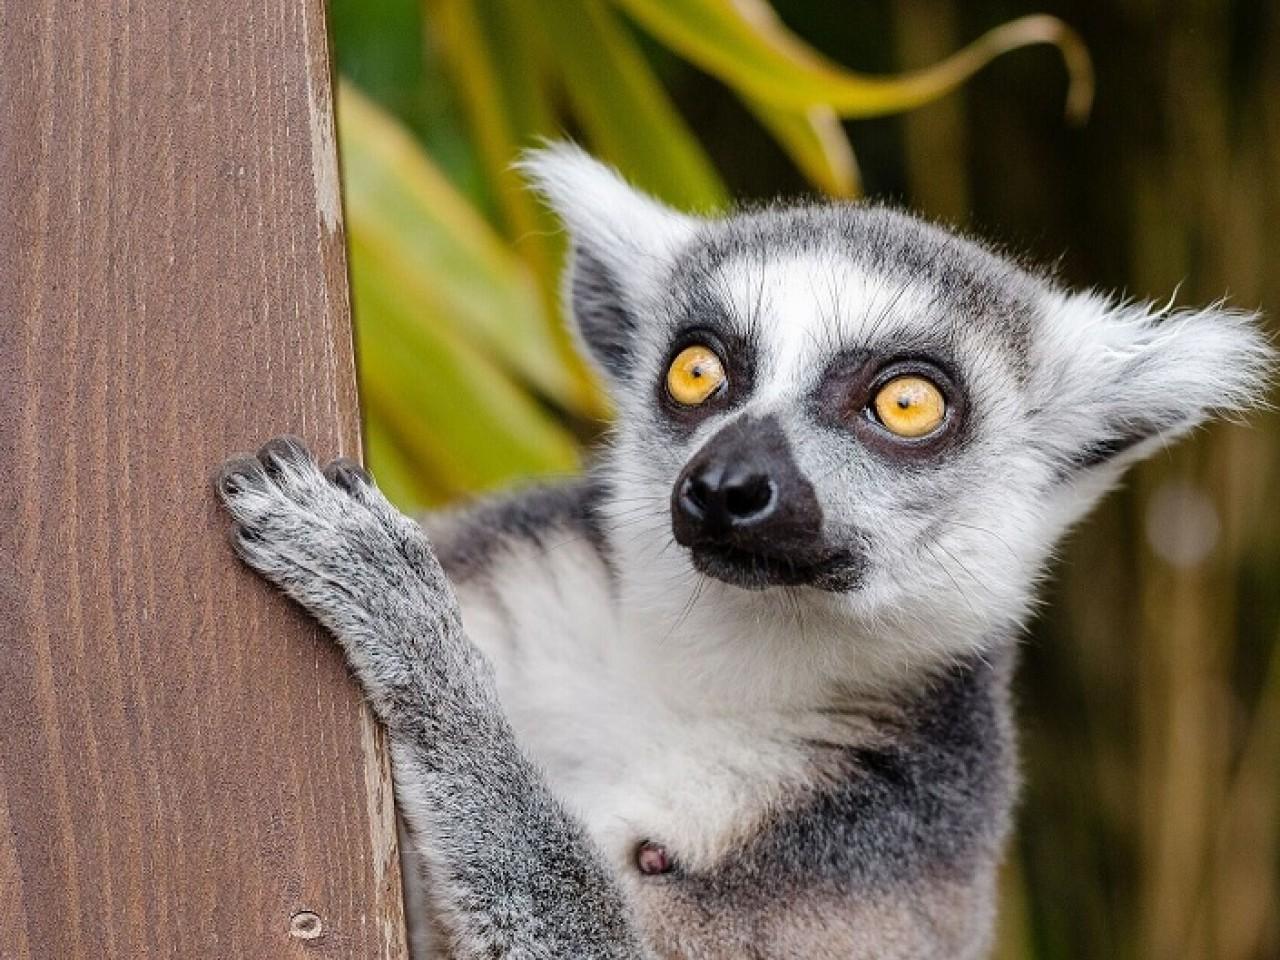 MADAGASCAR, ESPERIENZA UNICA E IRRIPETIBILE